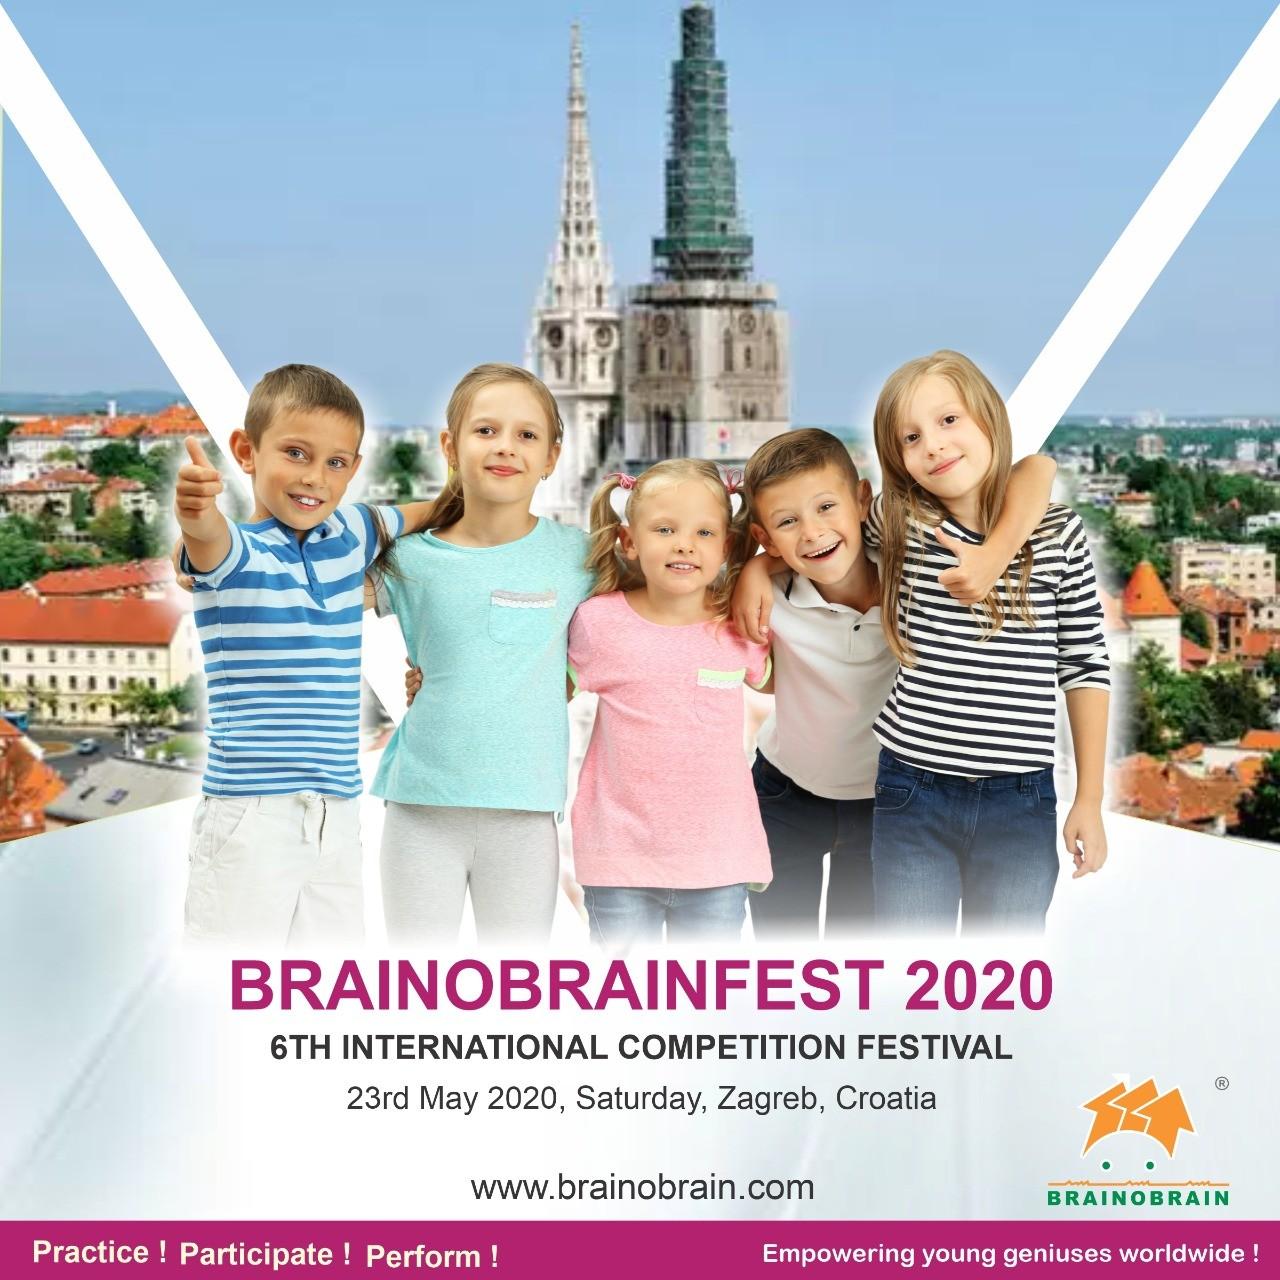 Brainobrain Fest 2020